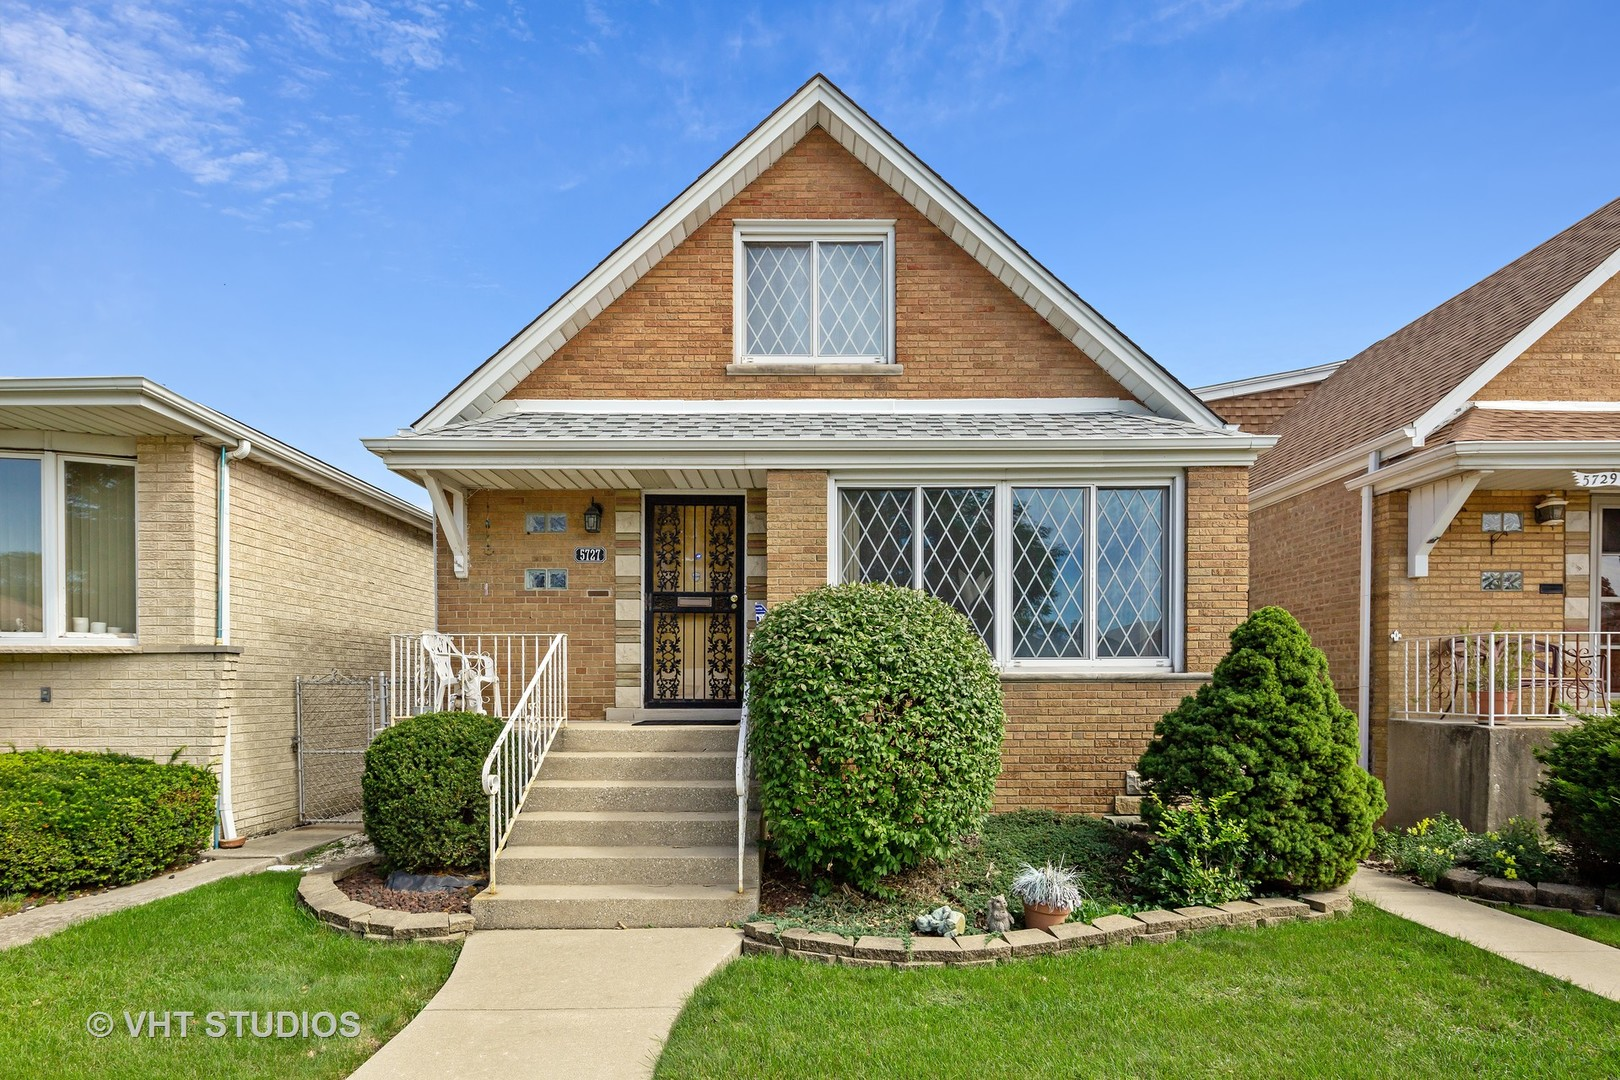 5727 Austin ,Chicago, Illinois 60638